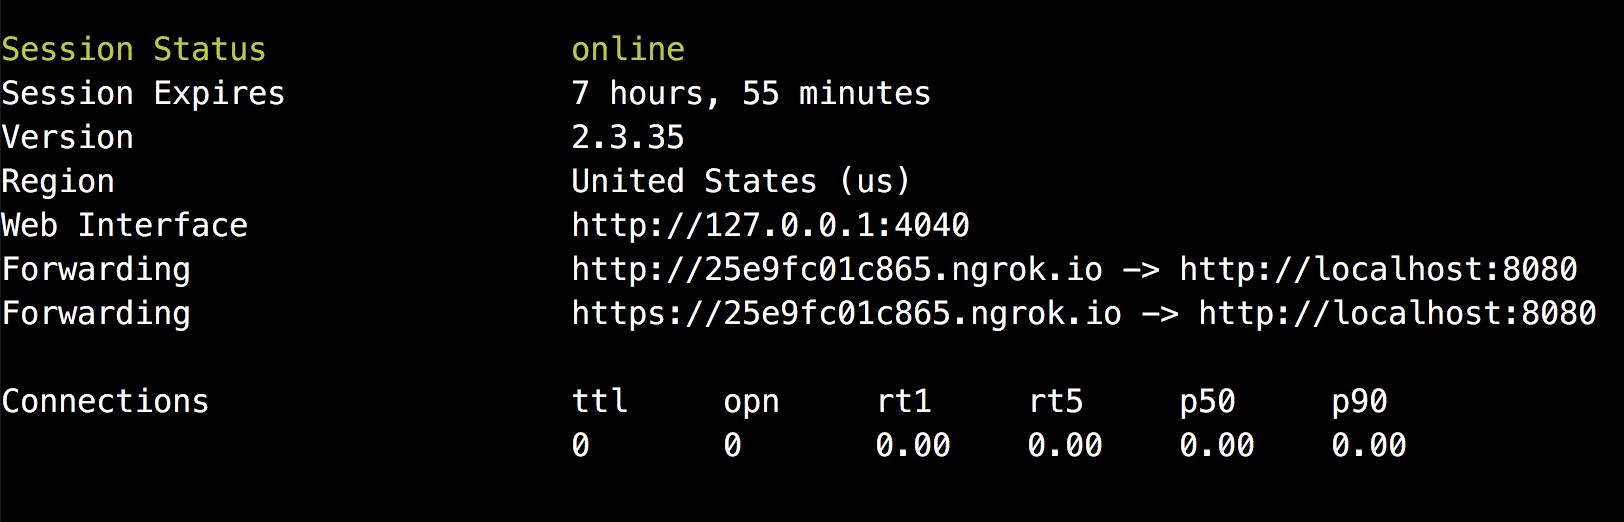 http://server.digimetriq.com/wp-content/uploads/2021/01/1610911800_233_Running-a-single-node-Kubernetes-cluster-using-Minikube-on-Ubuntu.png